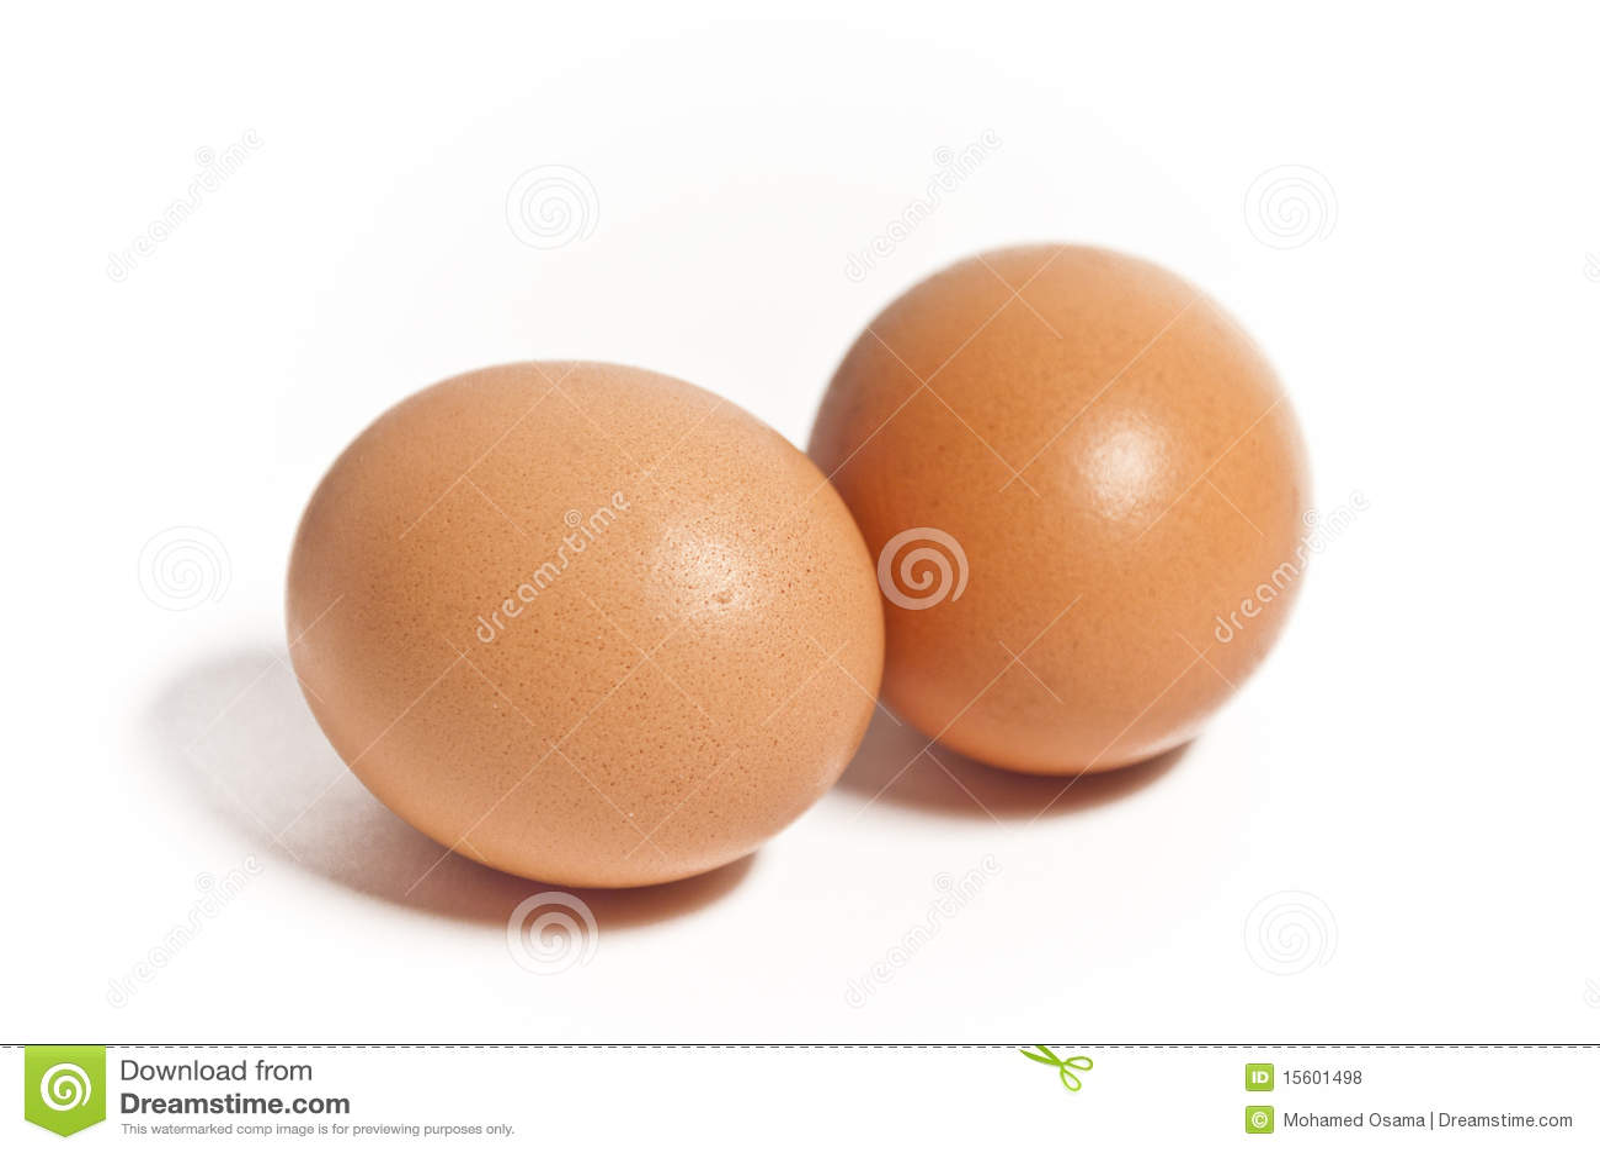 Eggs Vector Illustration | CartoonDealer.com #54208596